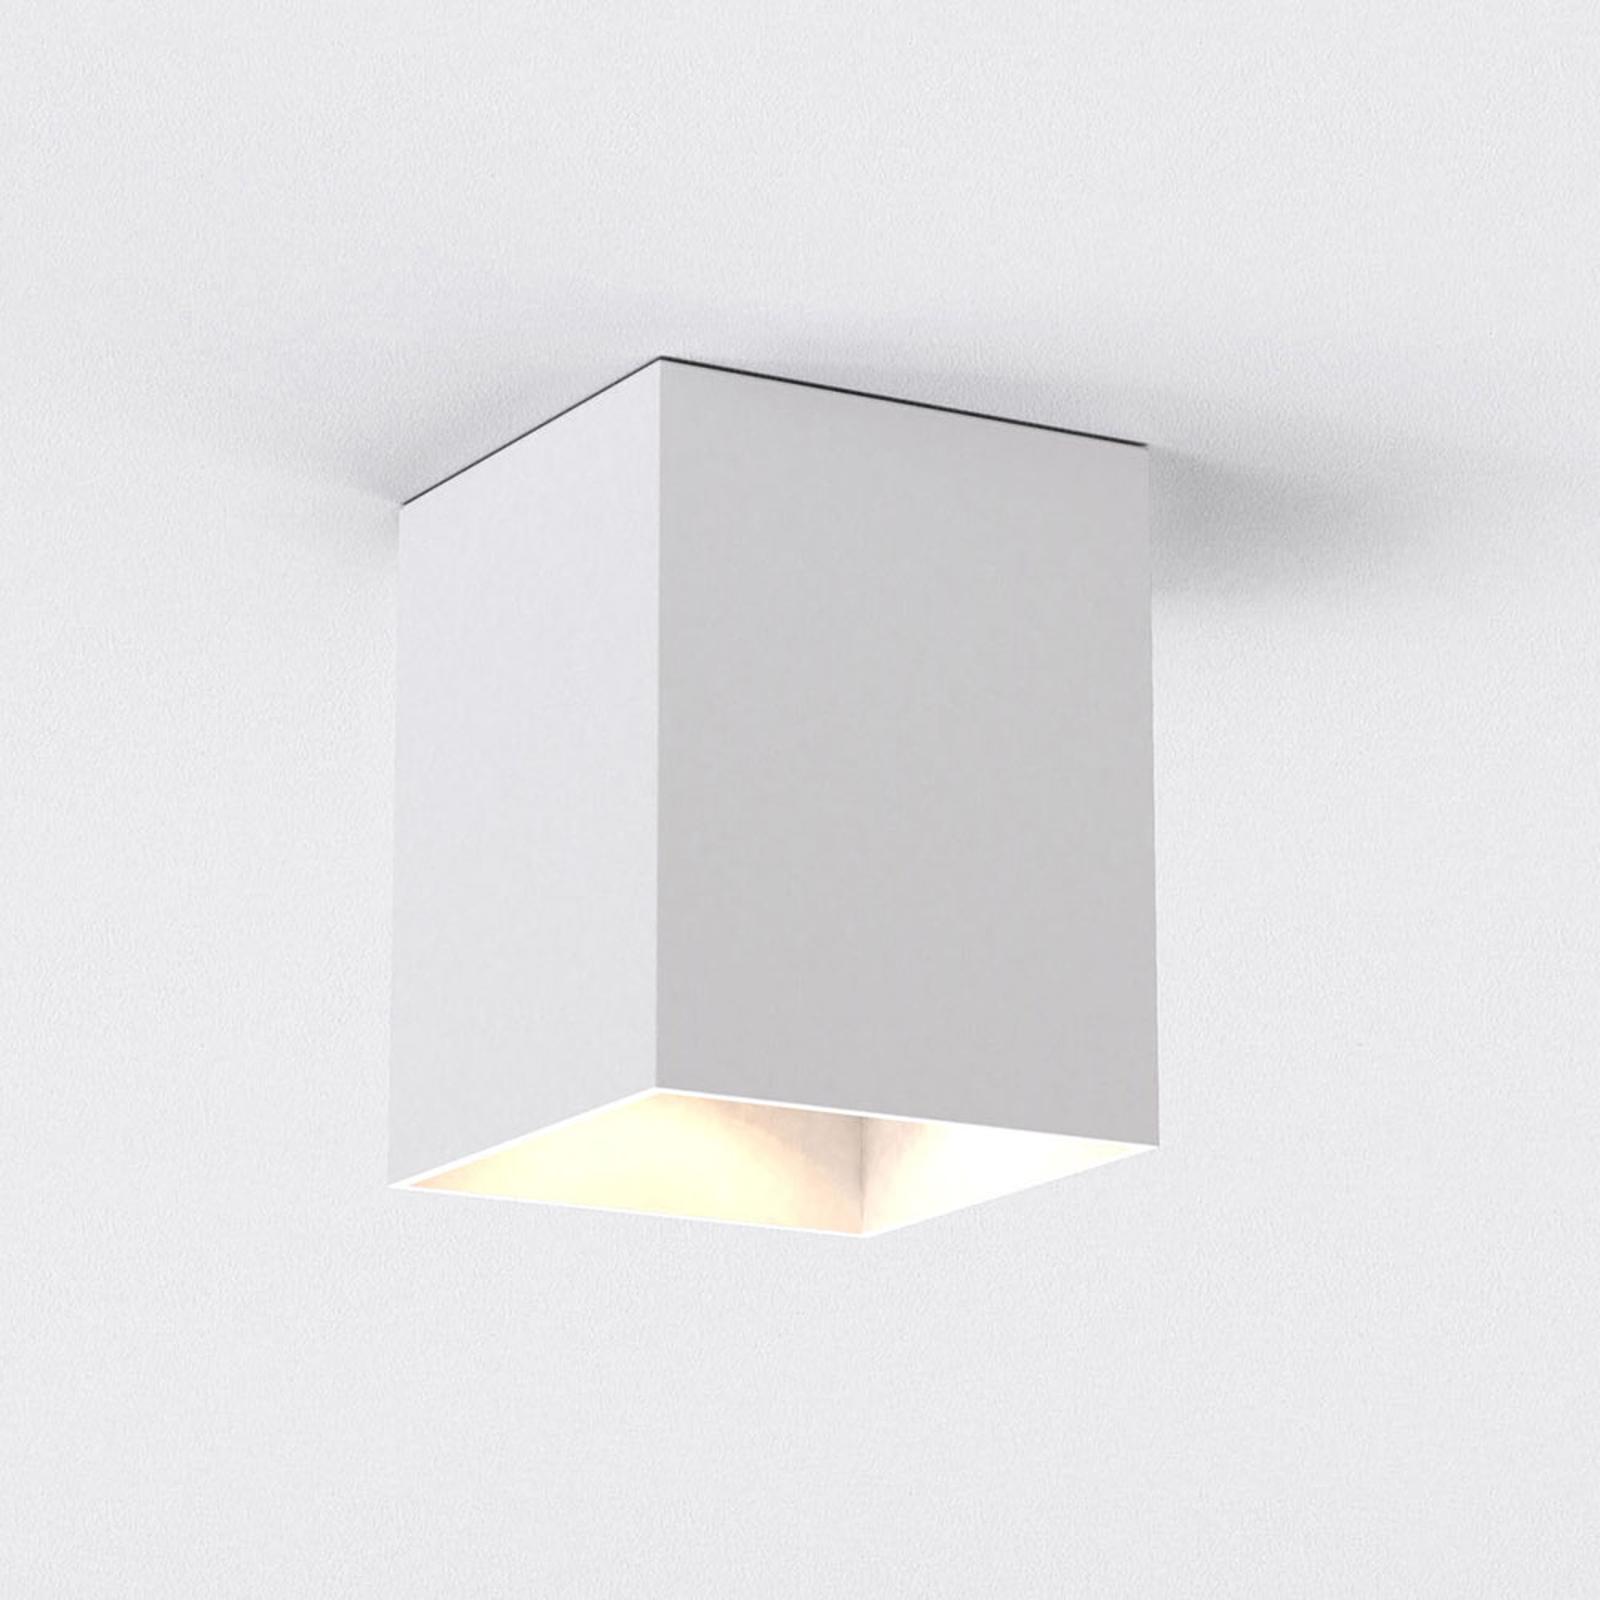 Astro Kinzo 140 plafonnier LED, blanc